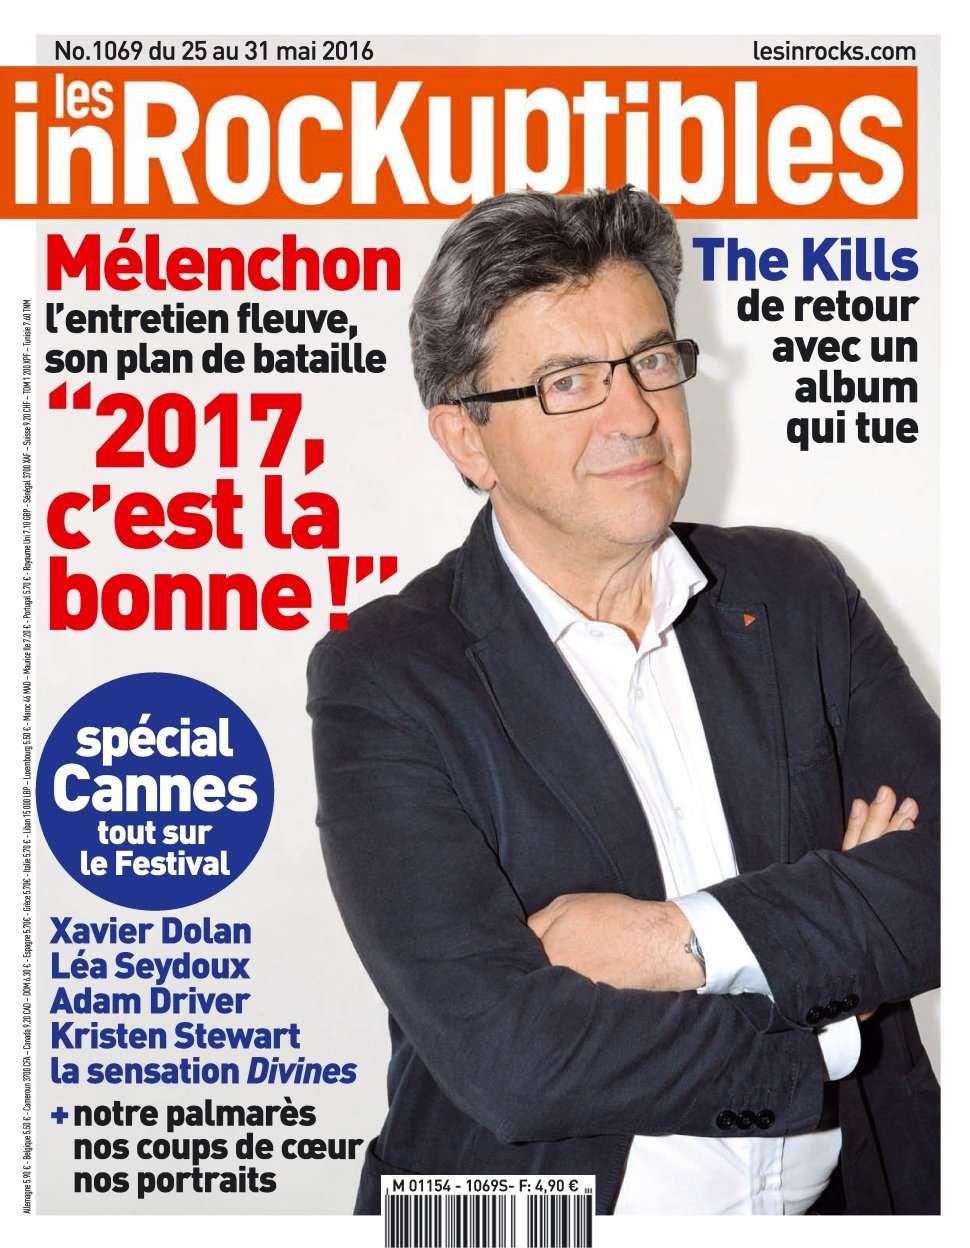 Les Inrockuptibles 1069 - 25 au 31 Mai 2016